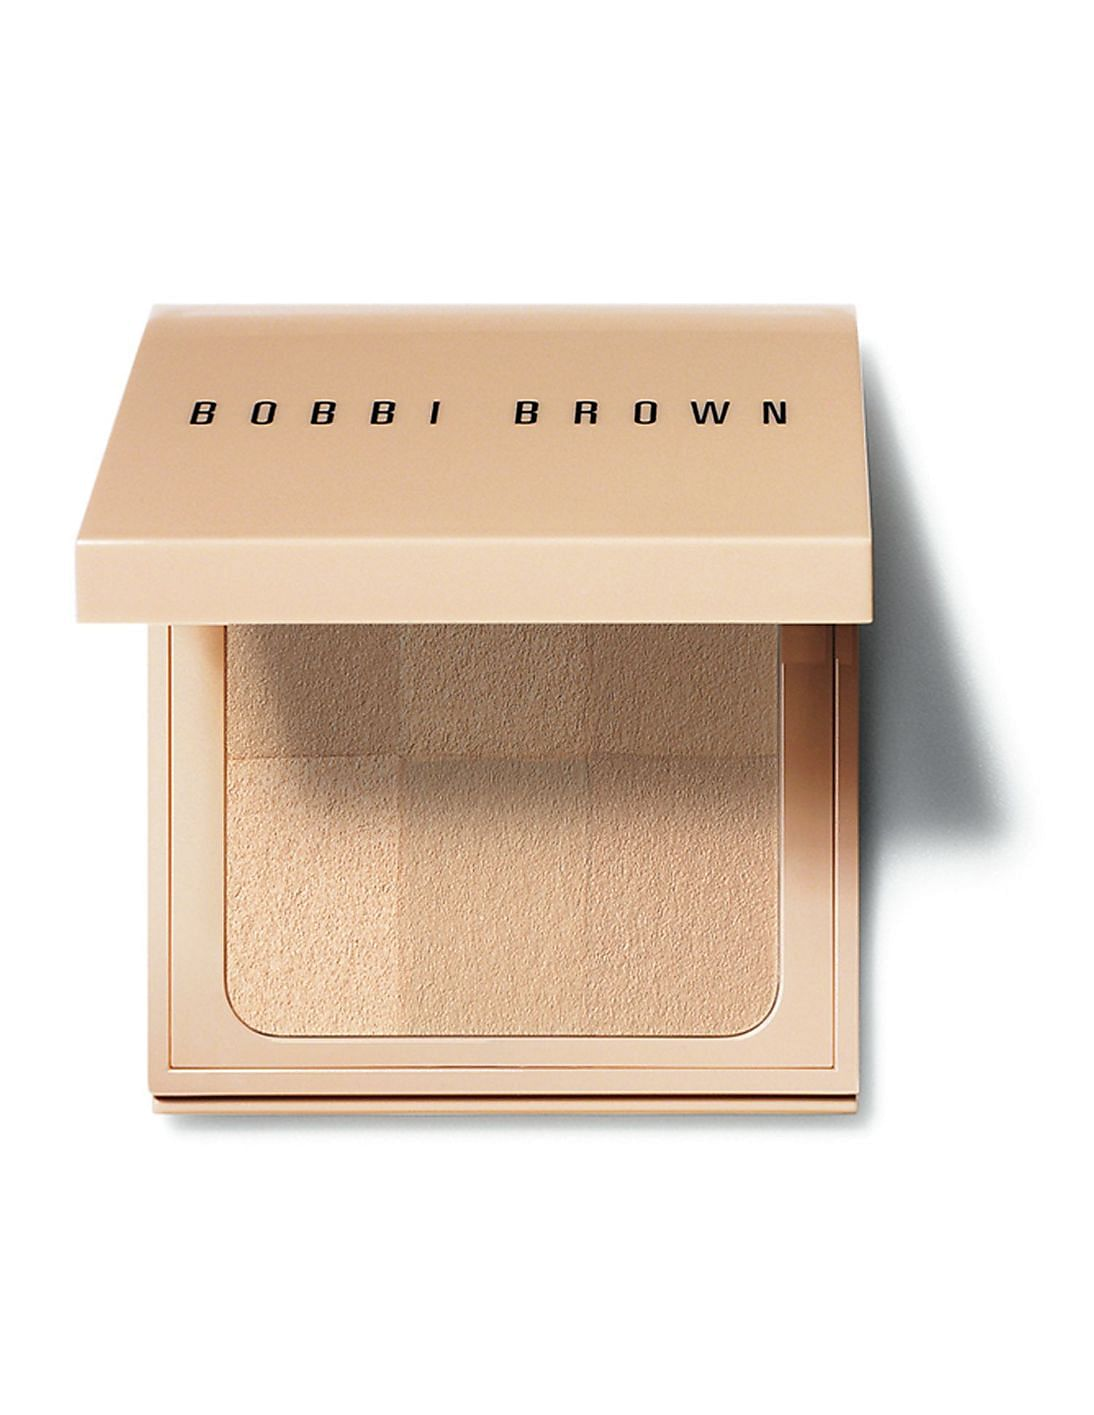 Bobbi Brown Nude Finish Illuminating Powder | Makeup | Beauty & Health | Shop The Exchange